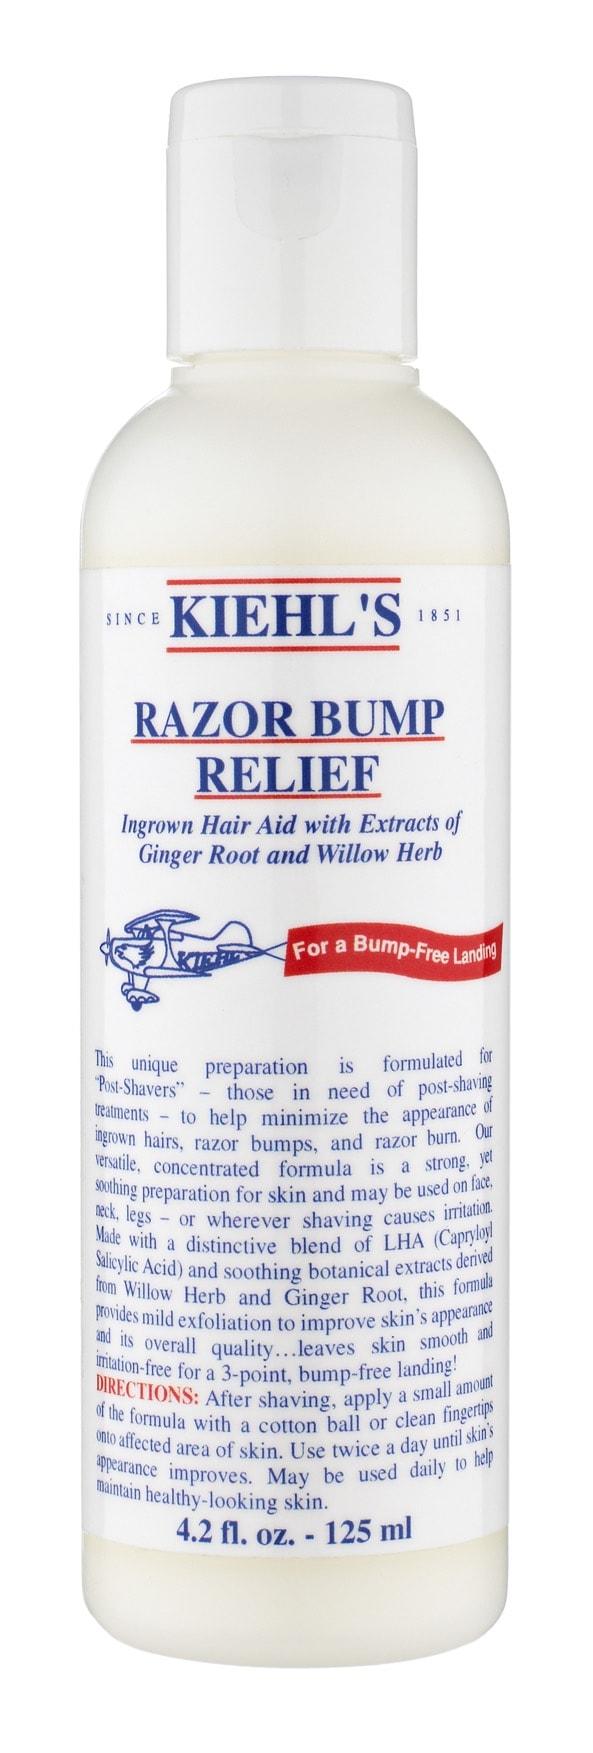 Razor Bump Relief 125ml